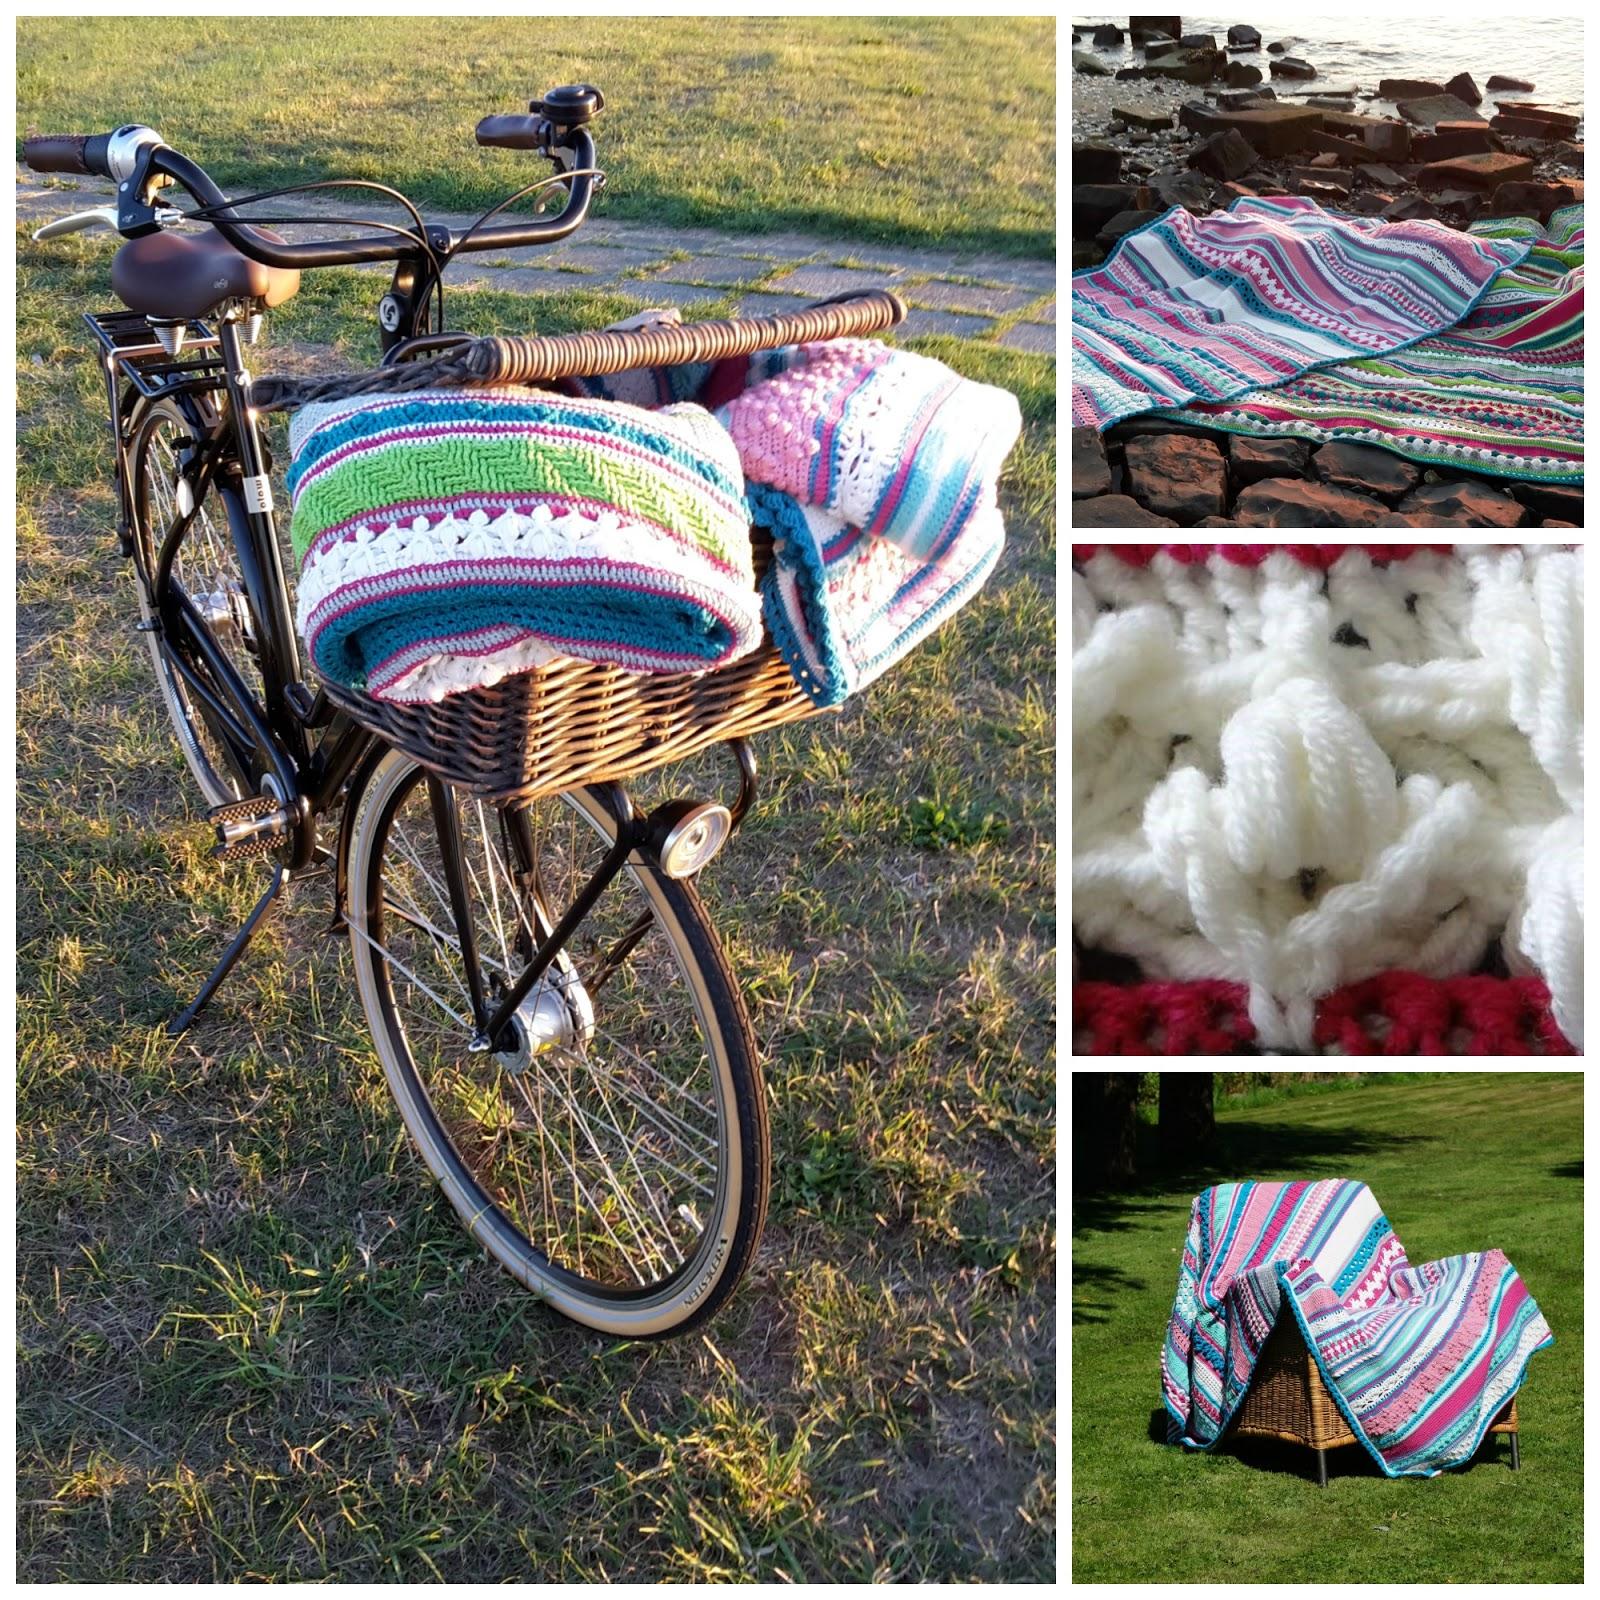 Crochet Along 2017 : Knutsels van Jolanda: Double Trouble Crochet ALong 2017